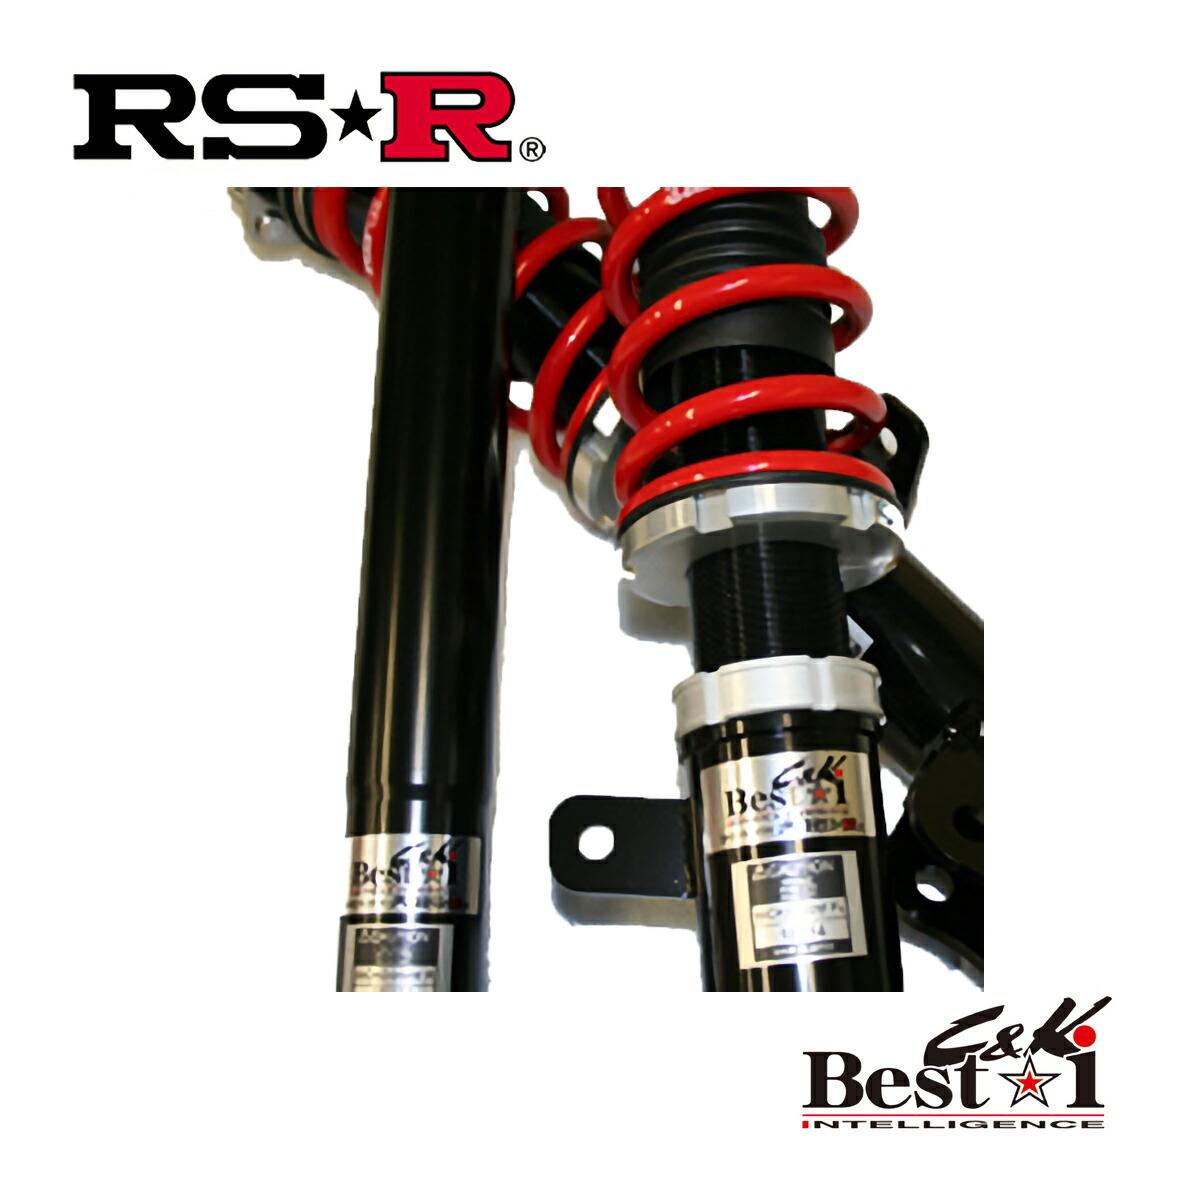 RS-R スペーシアカスタム ハイブリッドXS MK53S 車高調 リア車高調整 ネジ式 BICKS191M ベストi C&K RSR 個人宅発送追金有